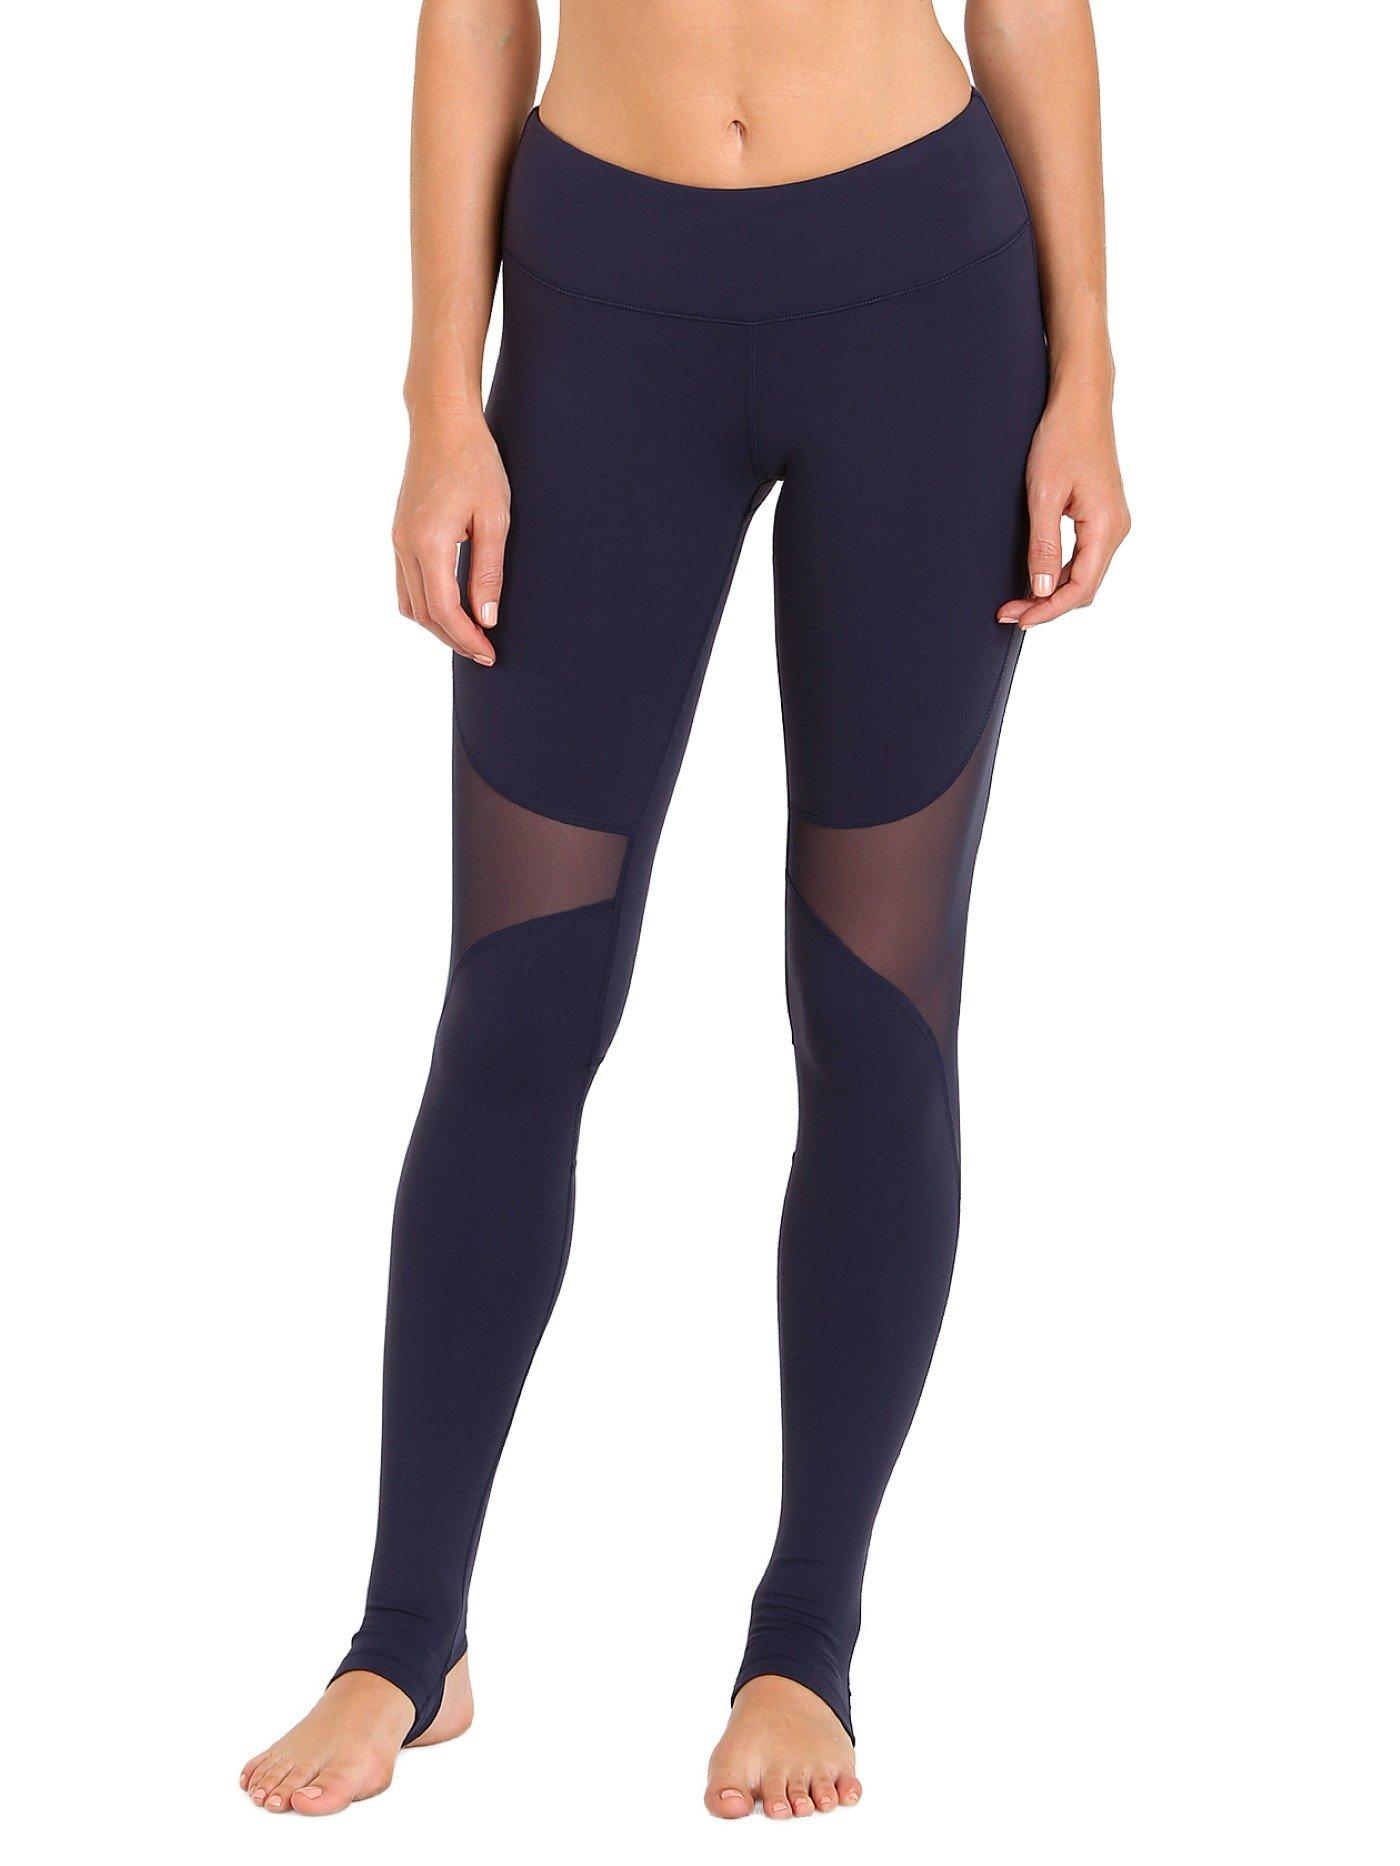 Alo Yoga Women's Coast Legging Pants, Rich Navy, XS